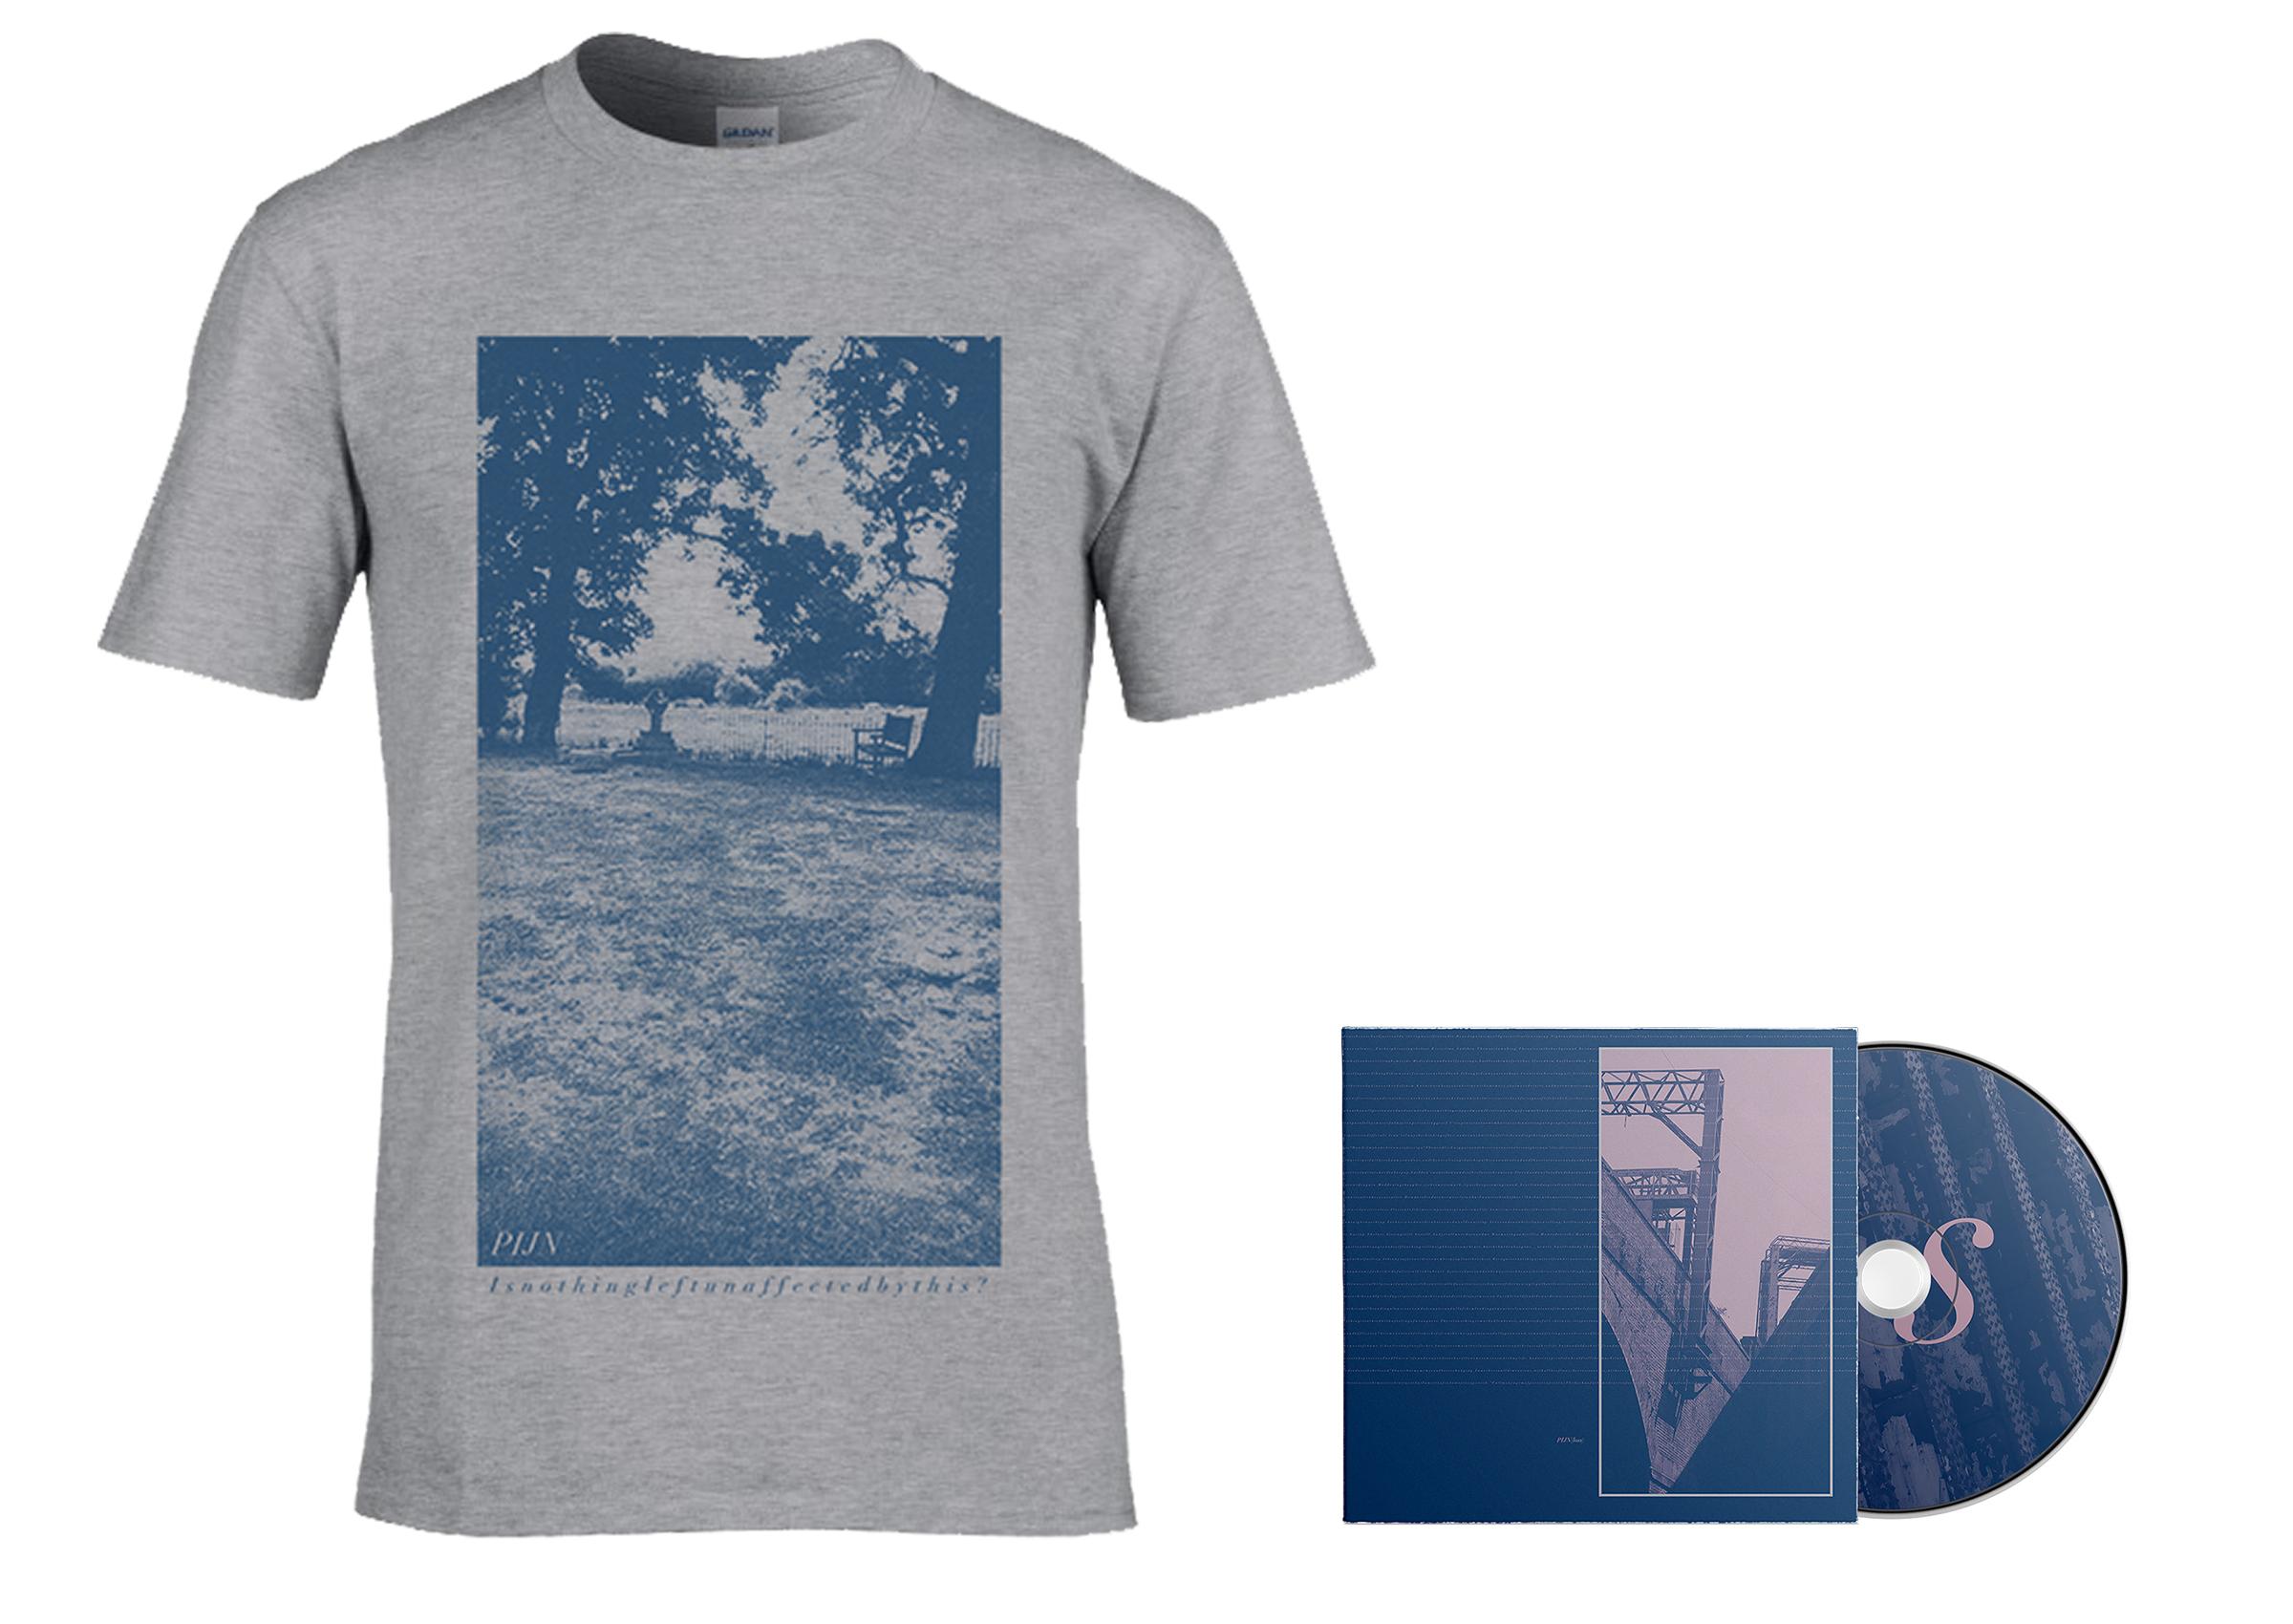 Pijn - Loss grey shirt + CD PREORDER